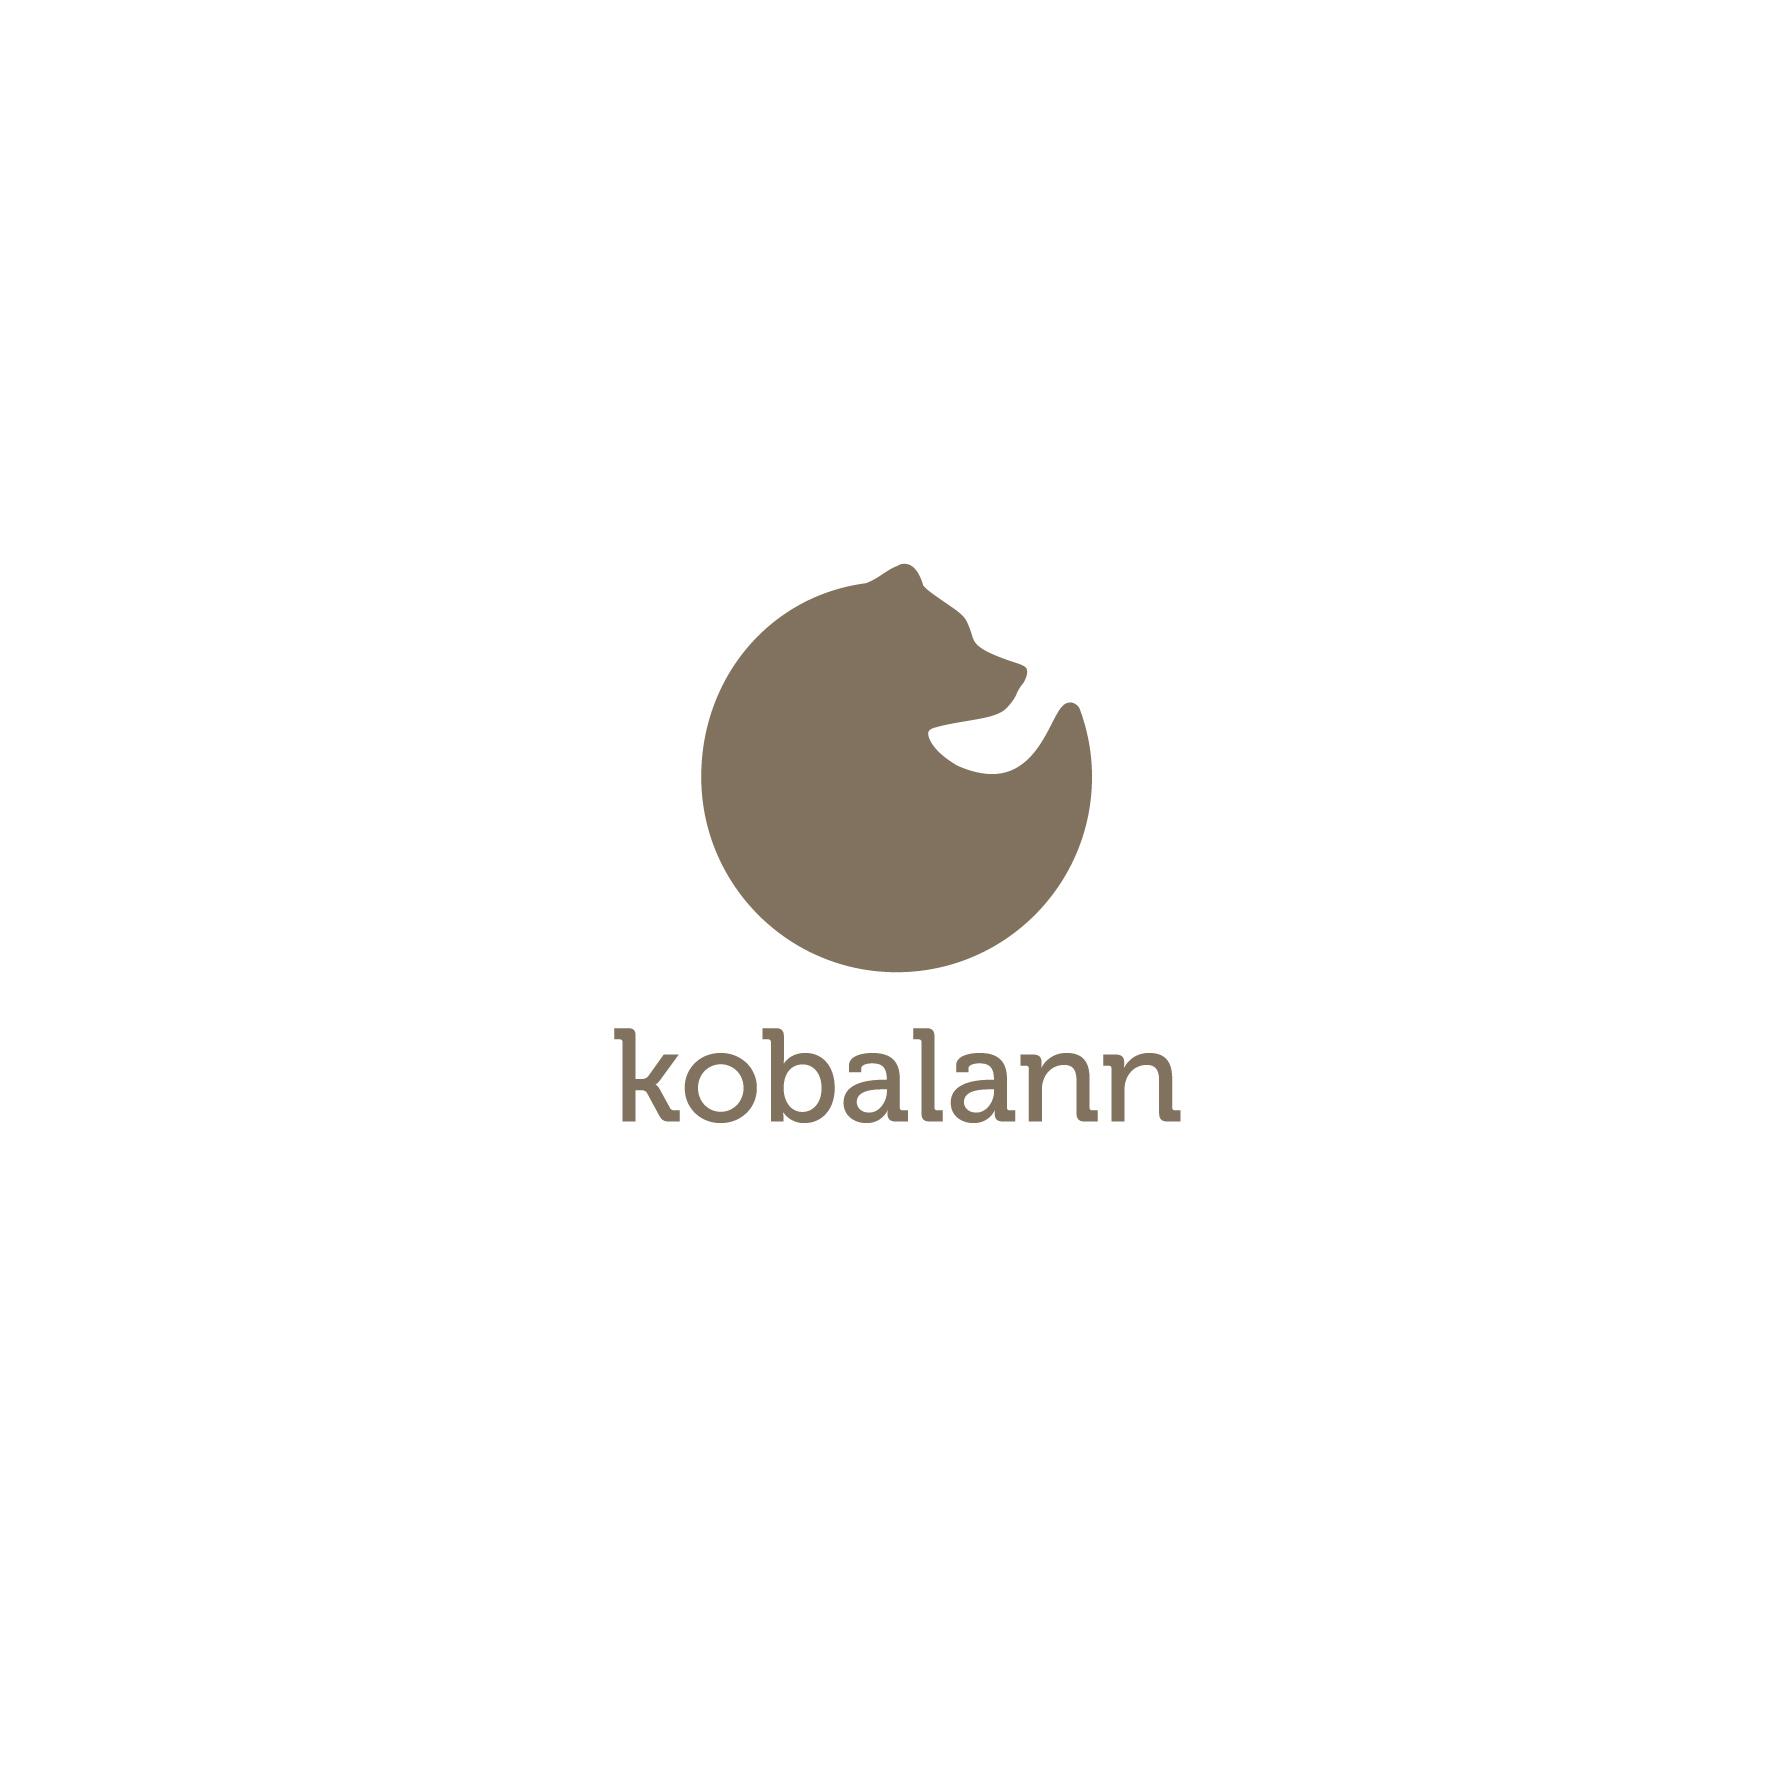 174_kobalann_logo.jpg -